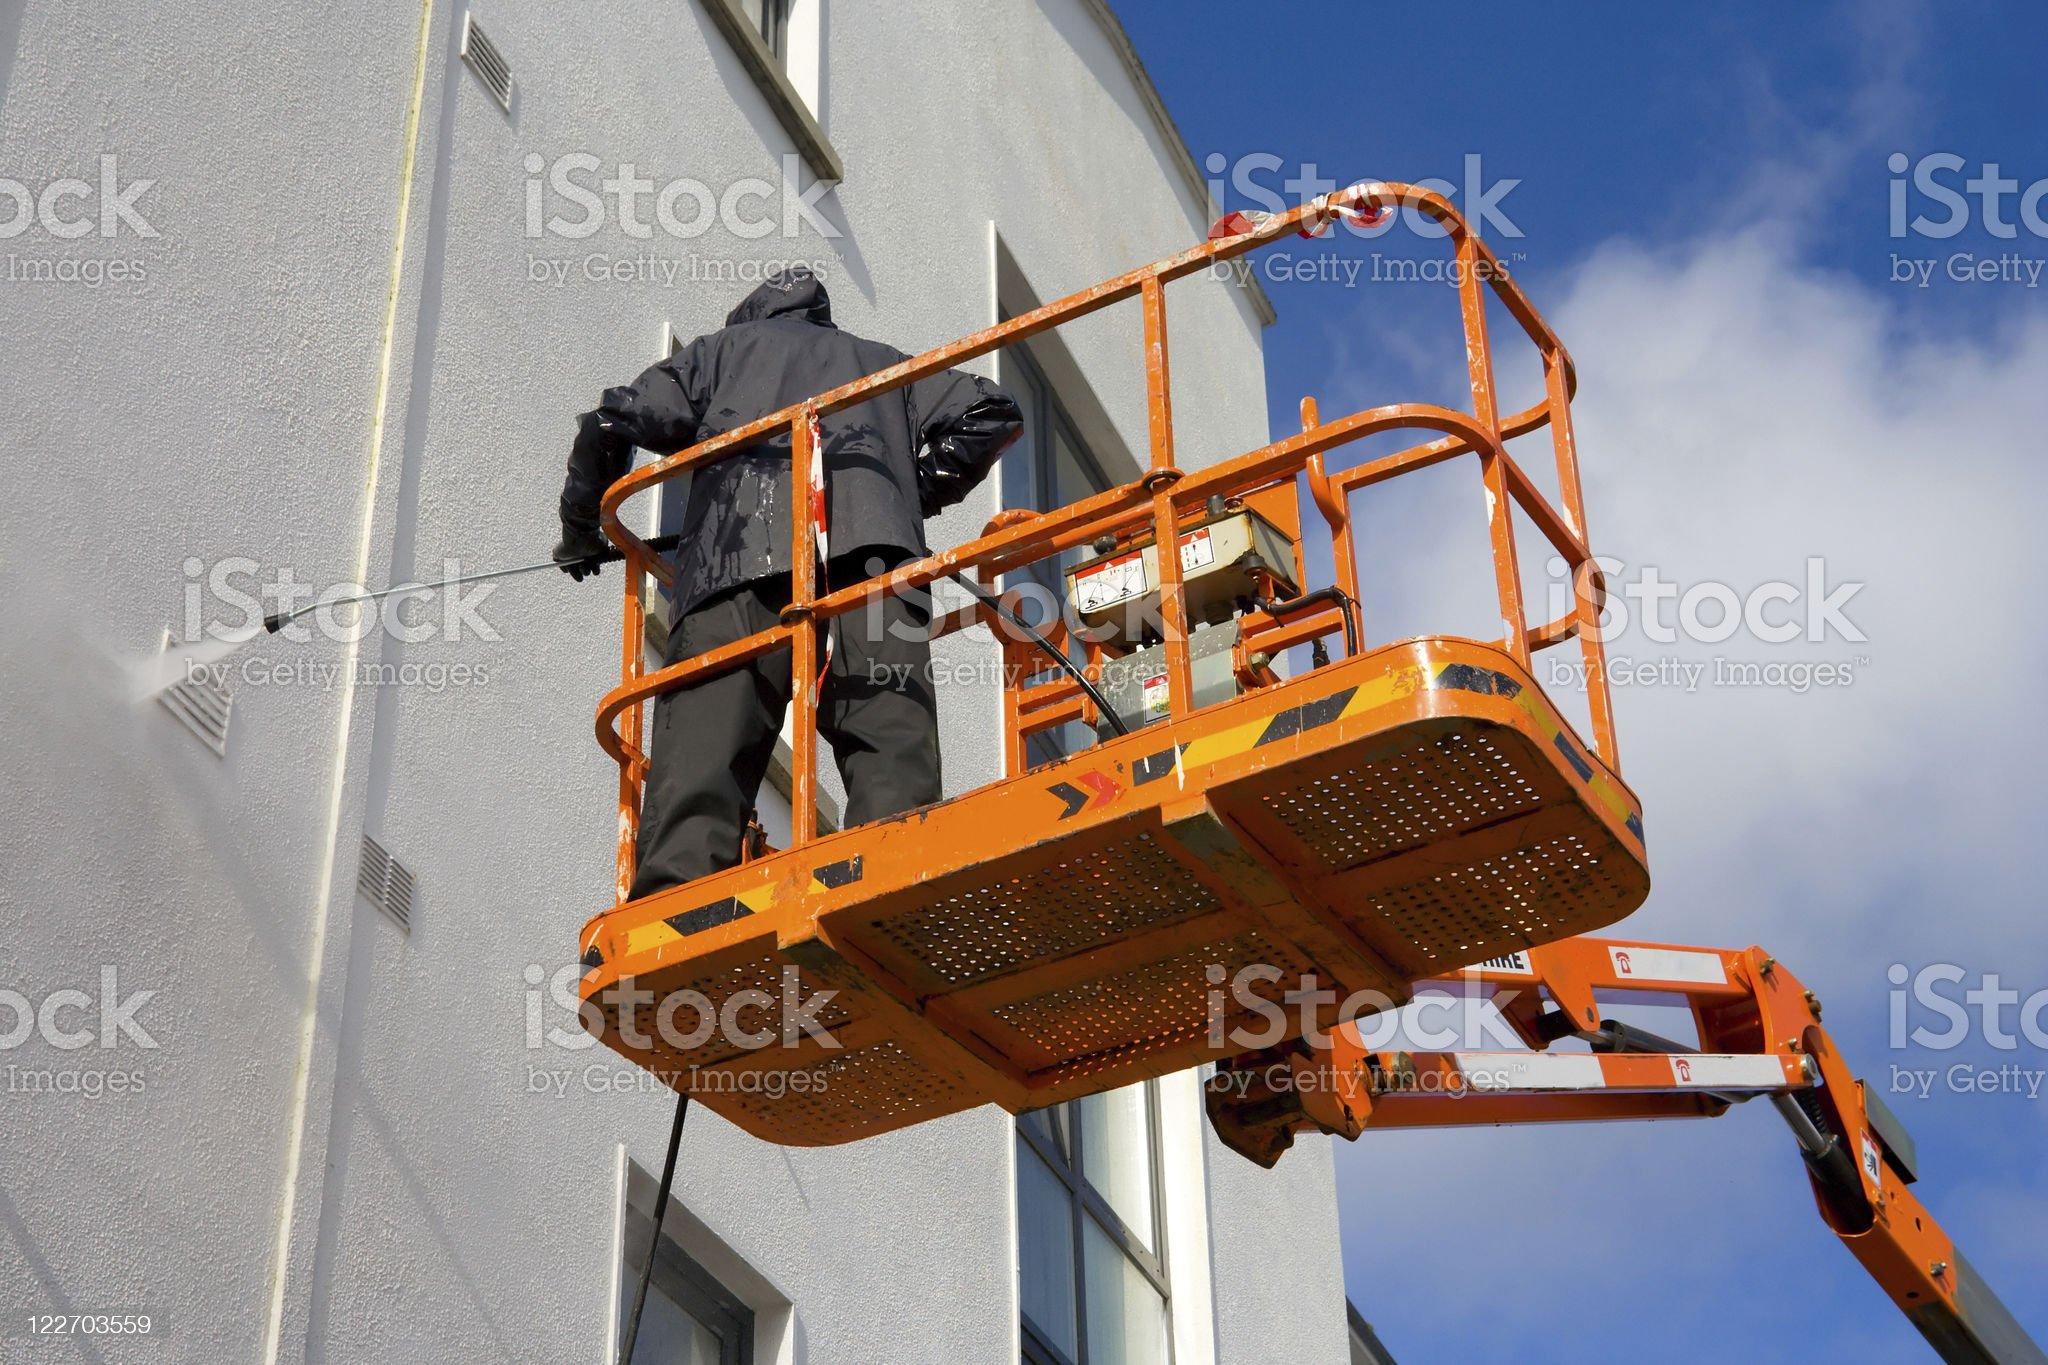 woker in platform washing a building royalty-free stock photo